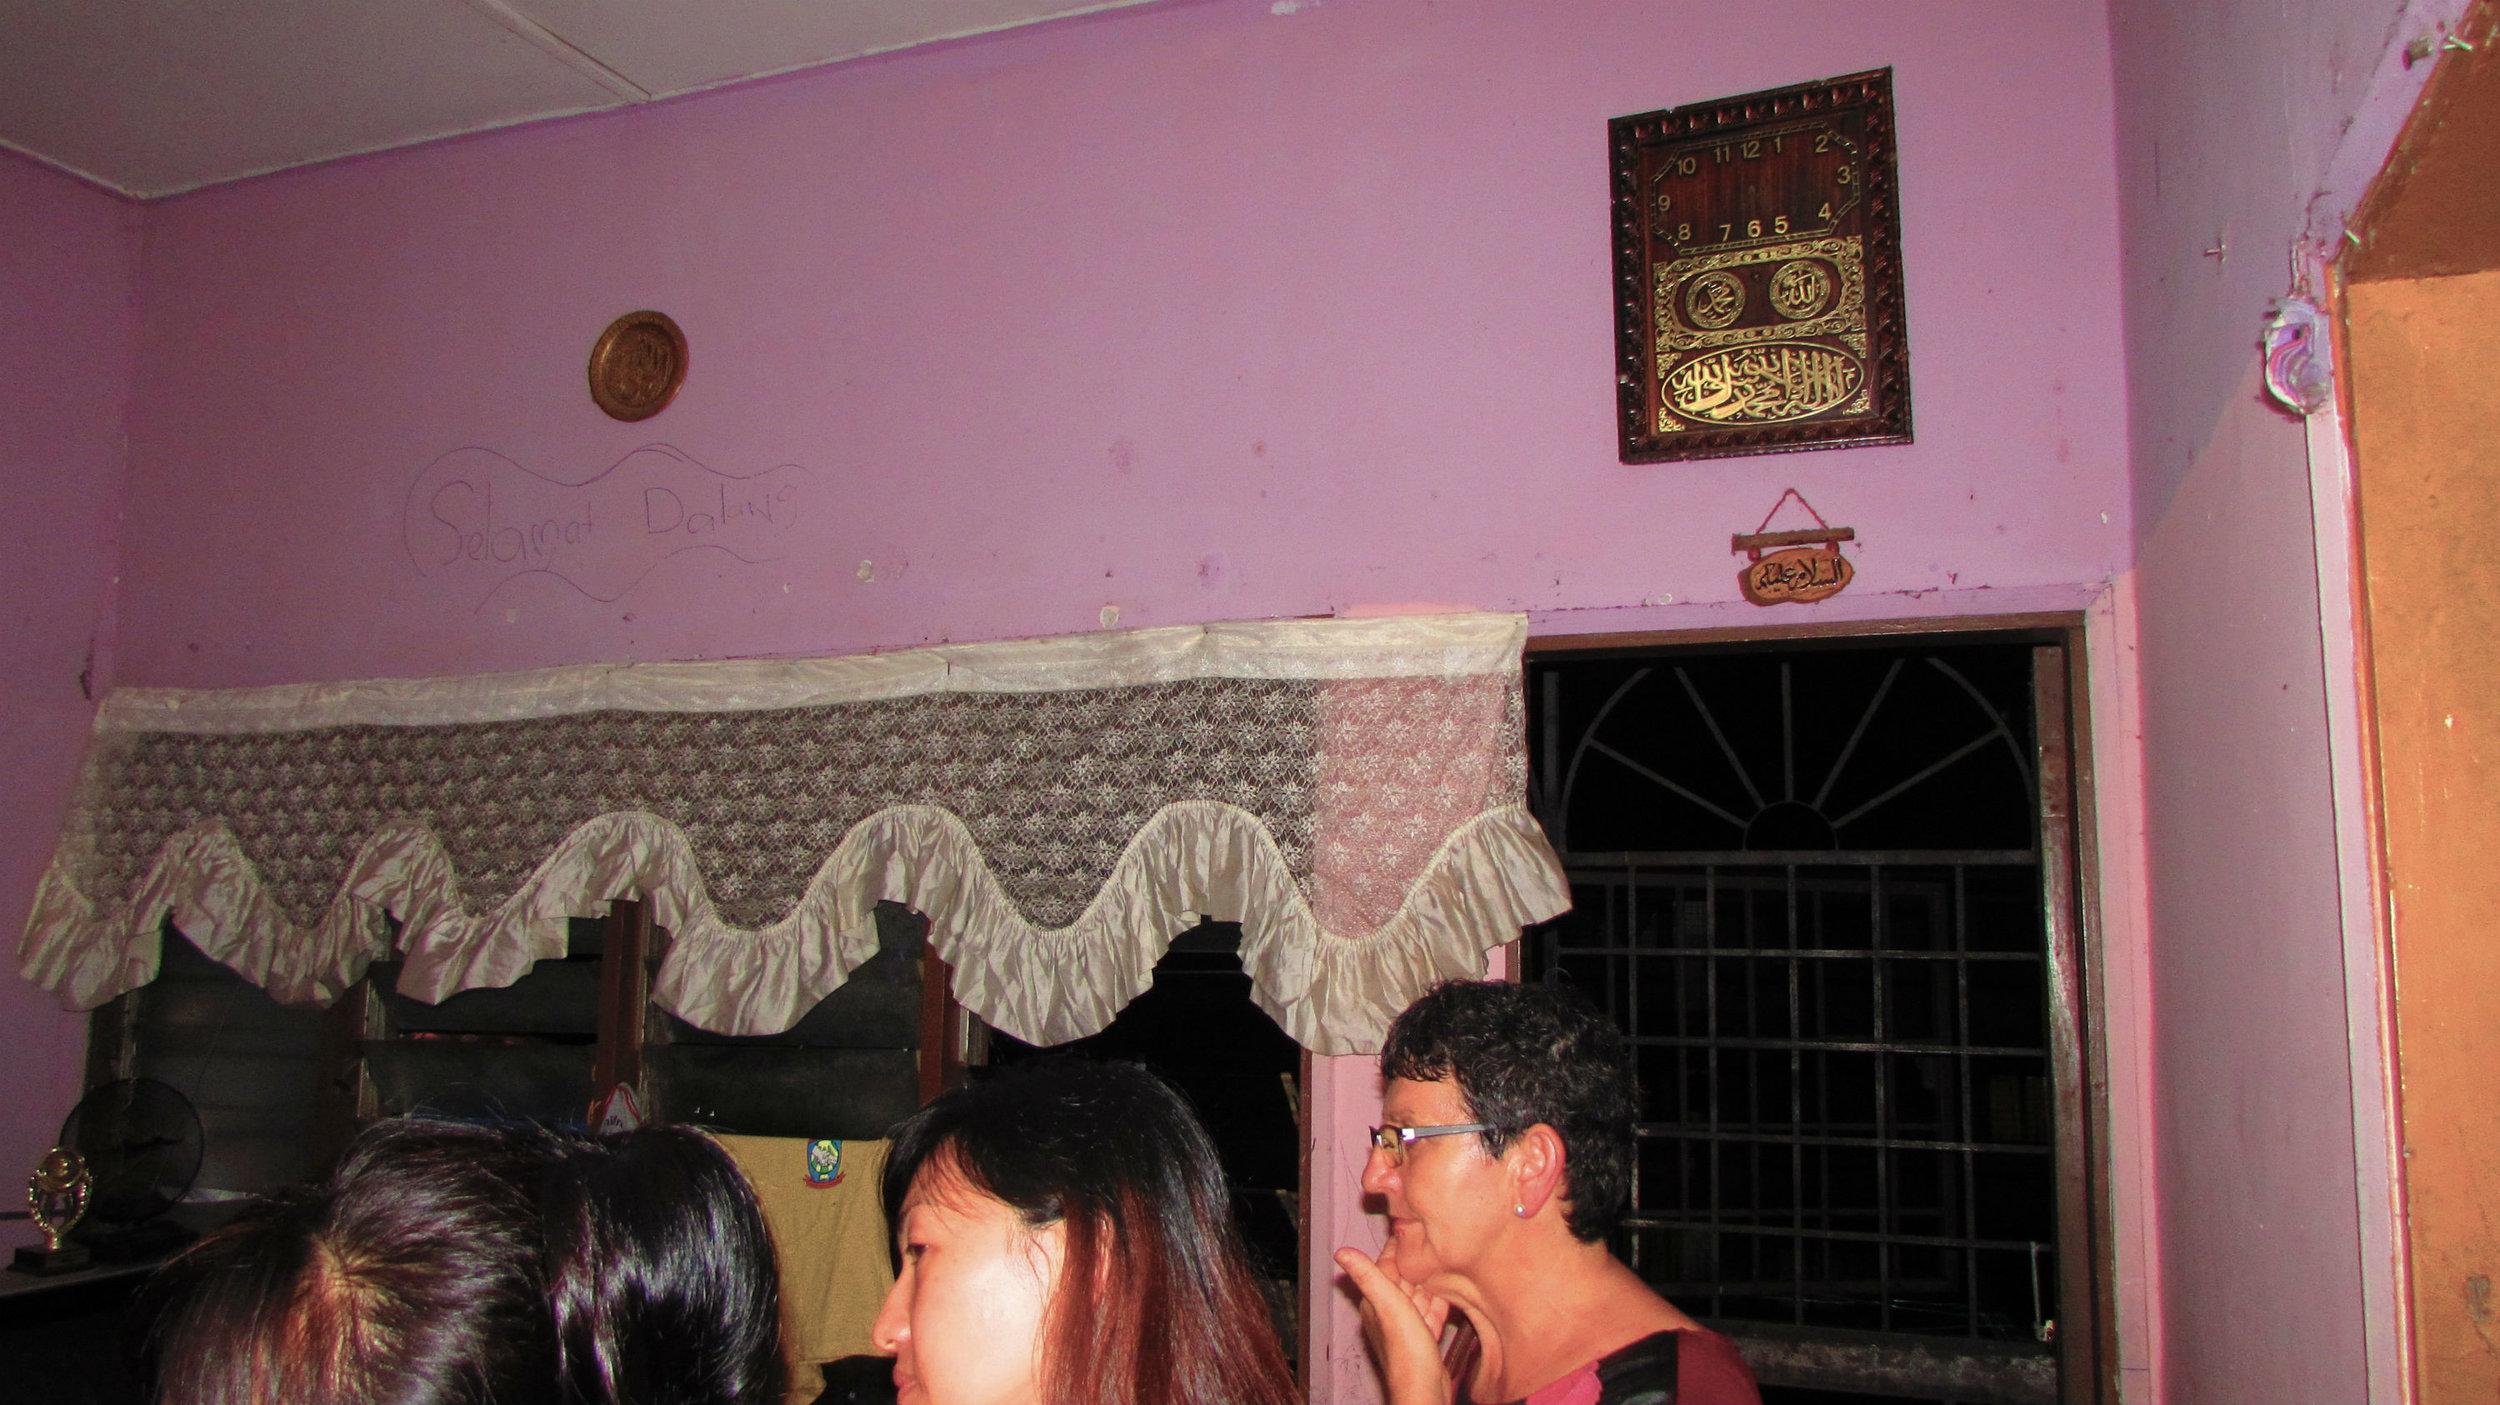 Koran verses hanging on the wall